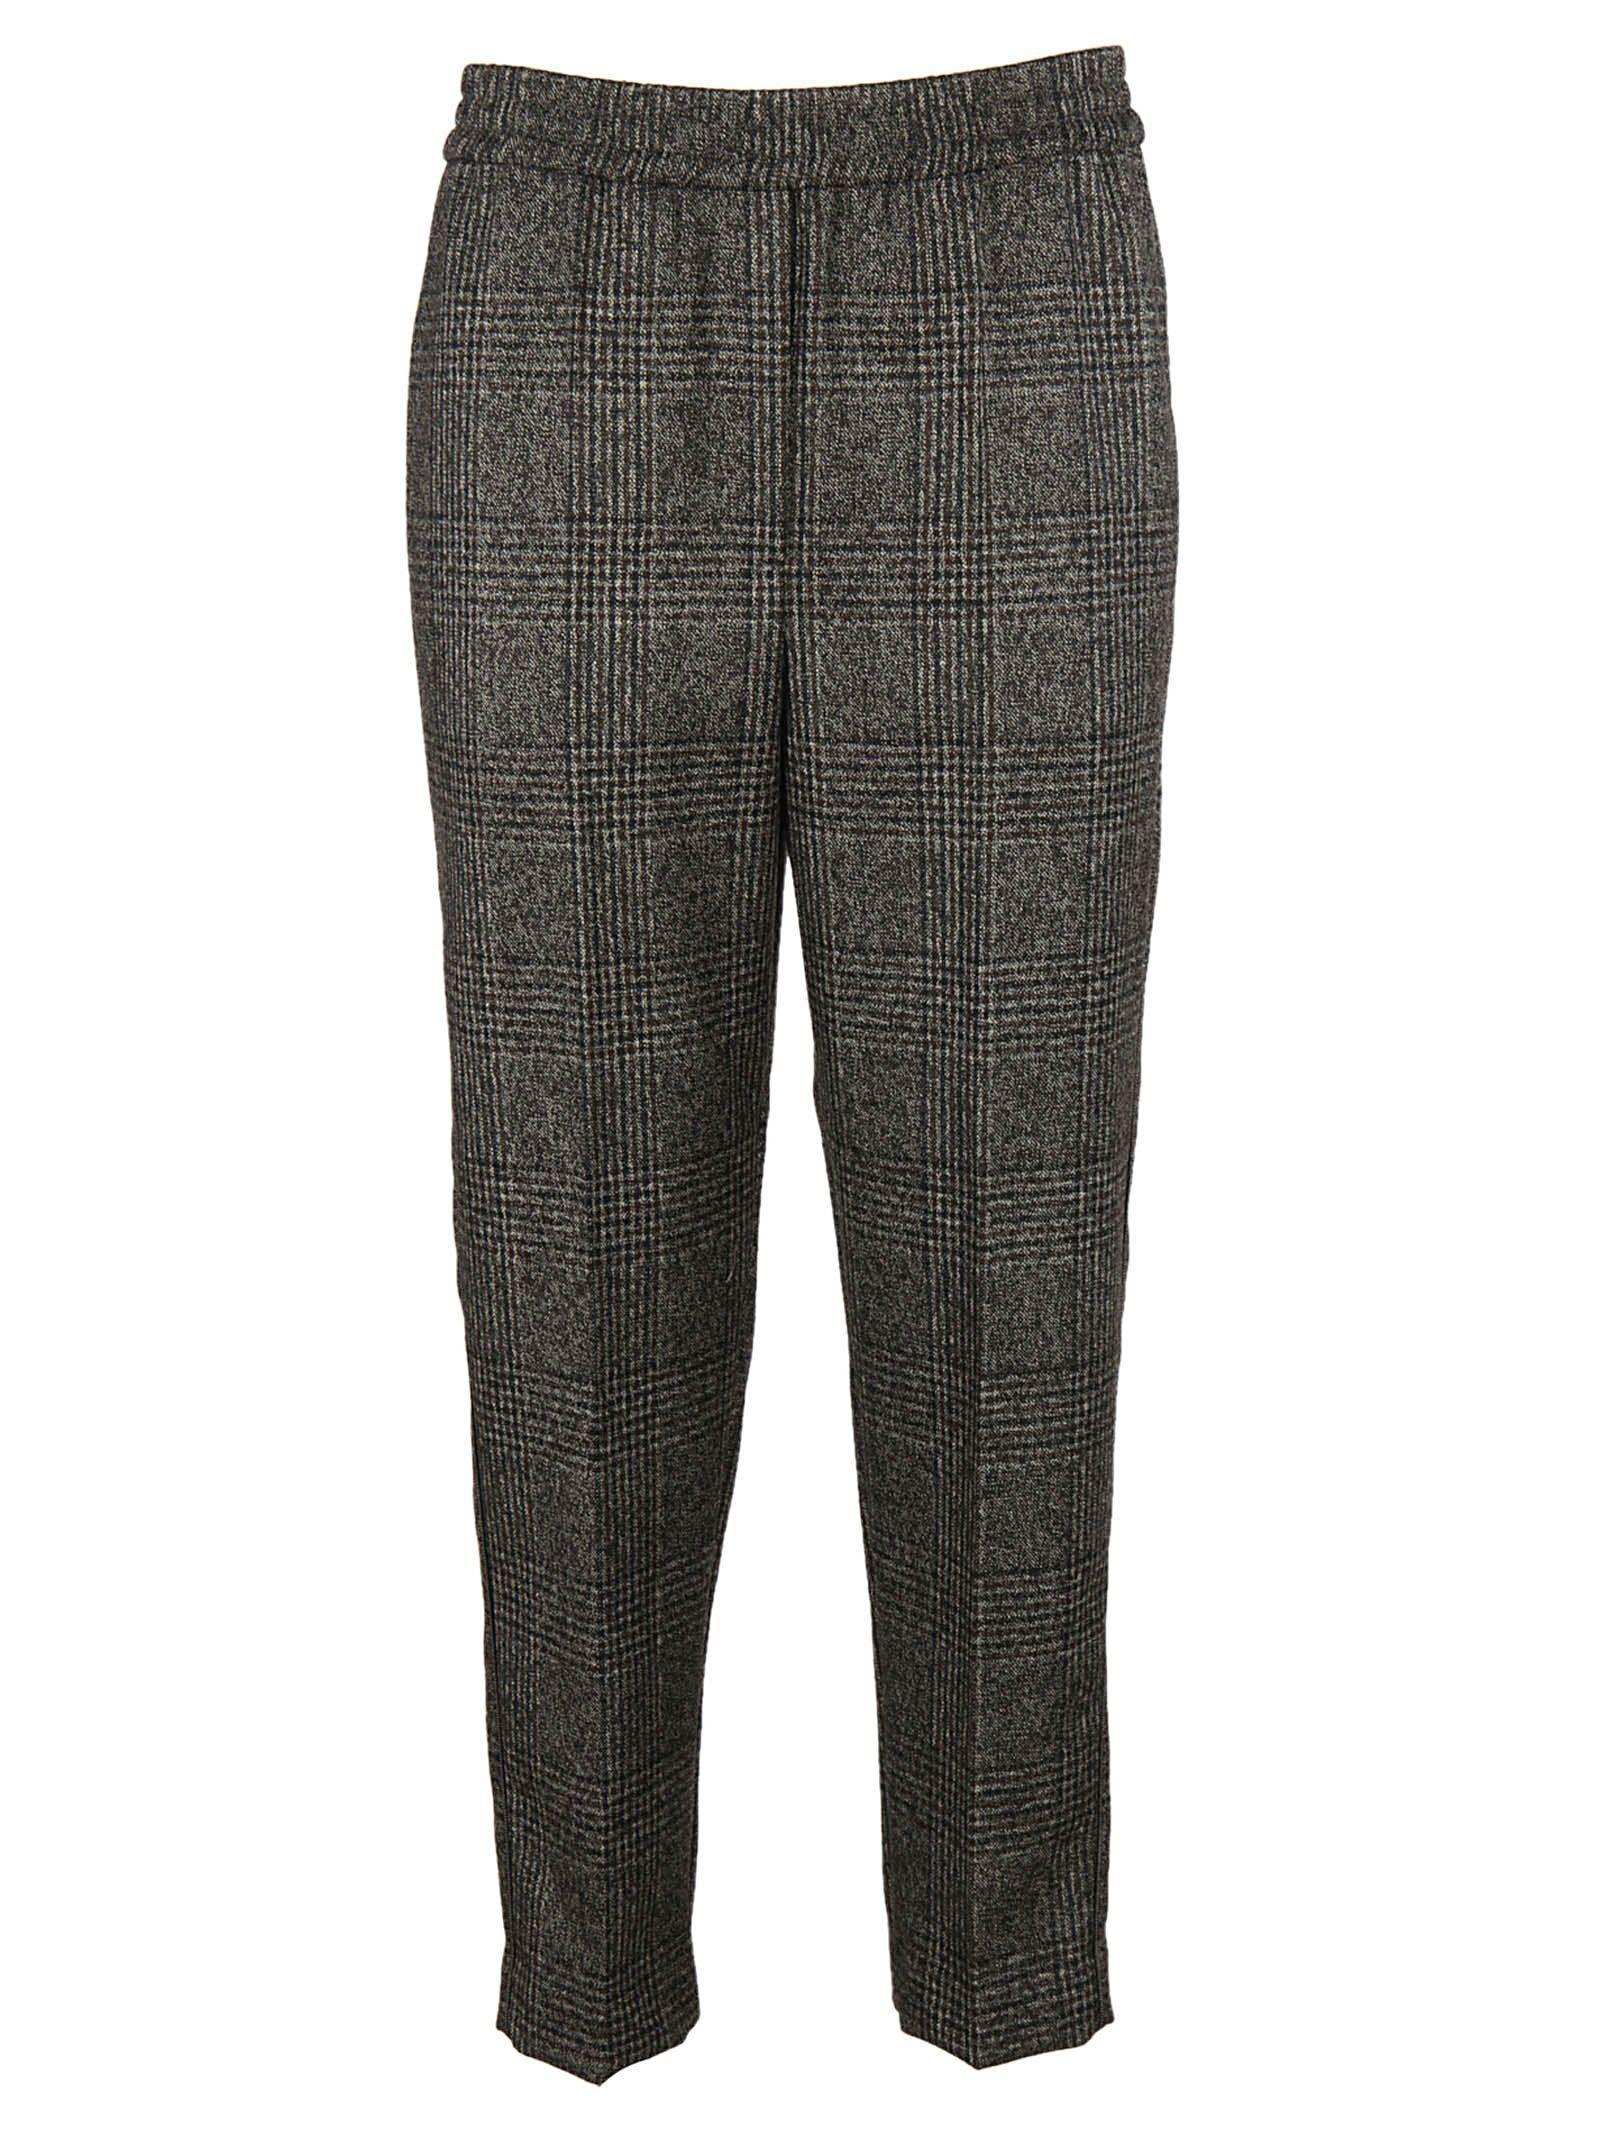 Brunello Cucinelli Classic Checkered Trousers In Grey